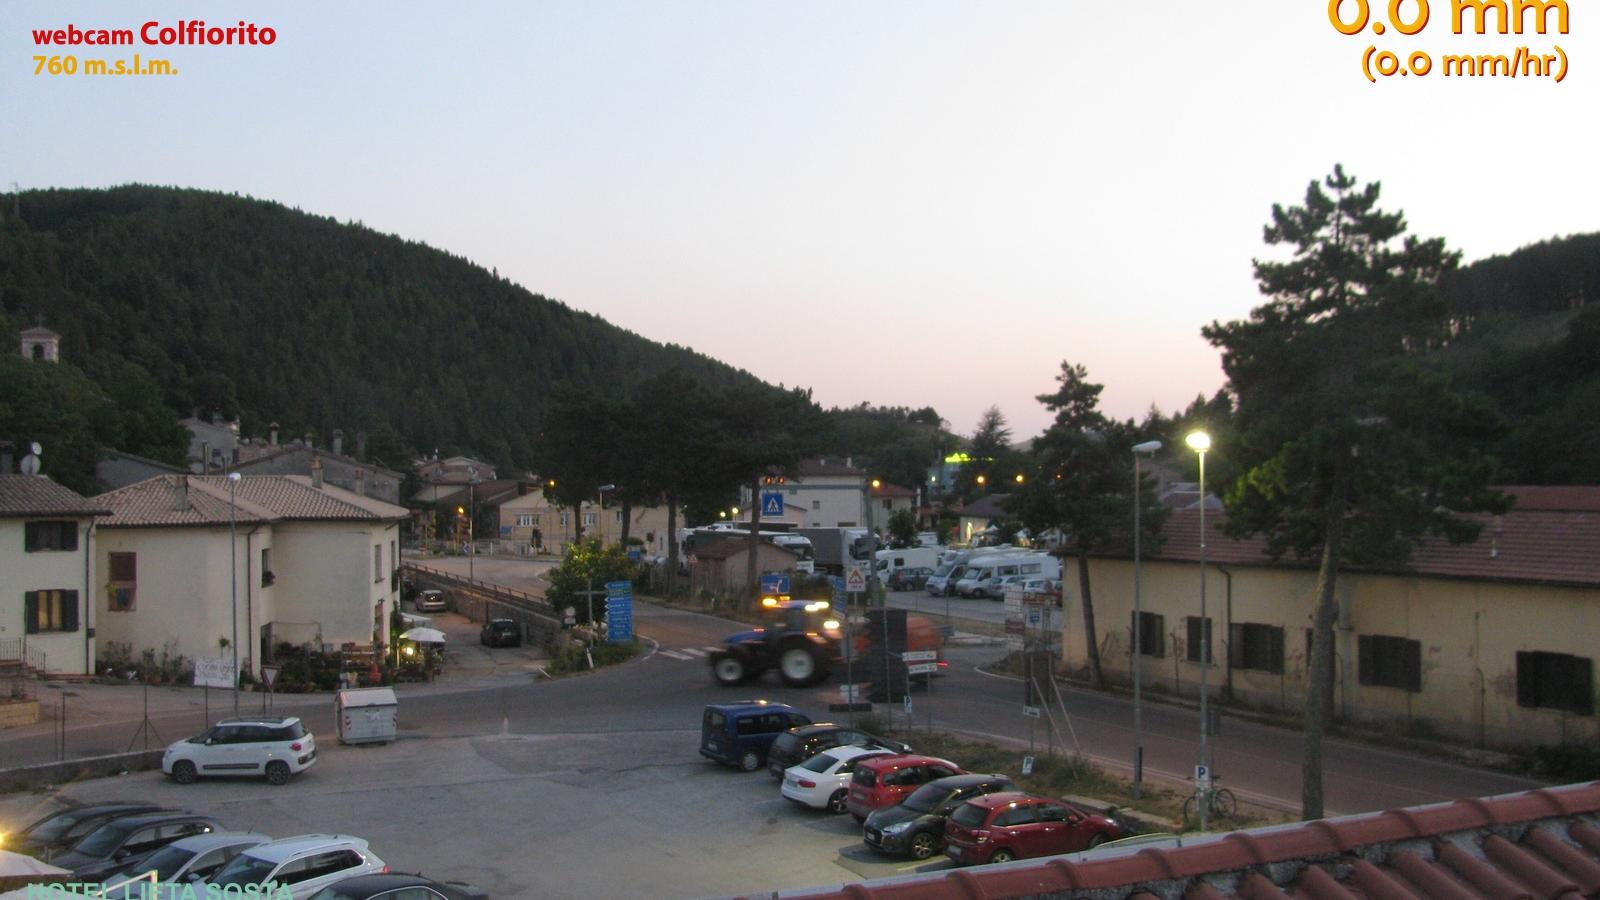 Webcam Colfiorito: PG